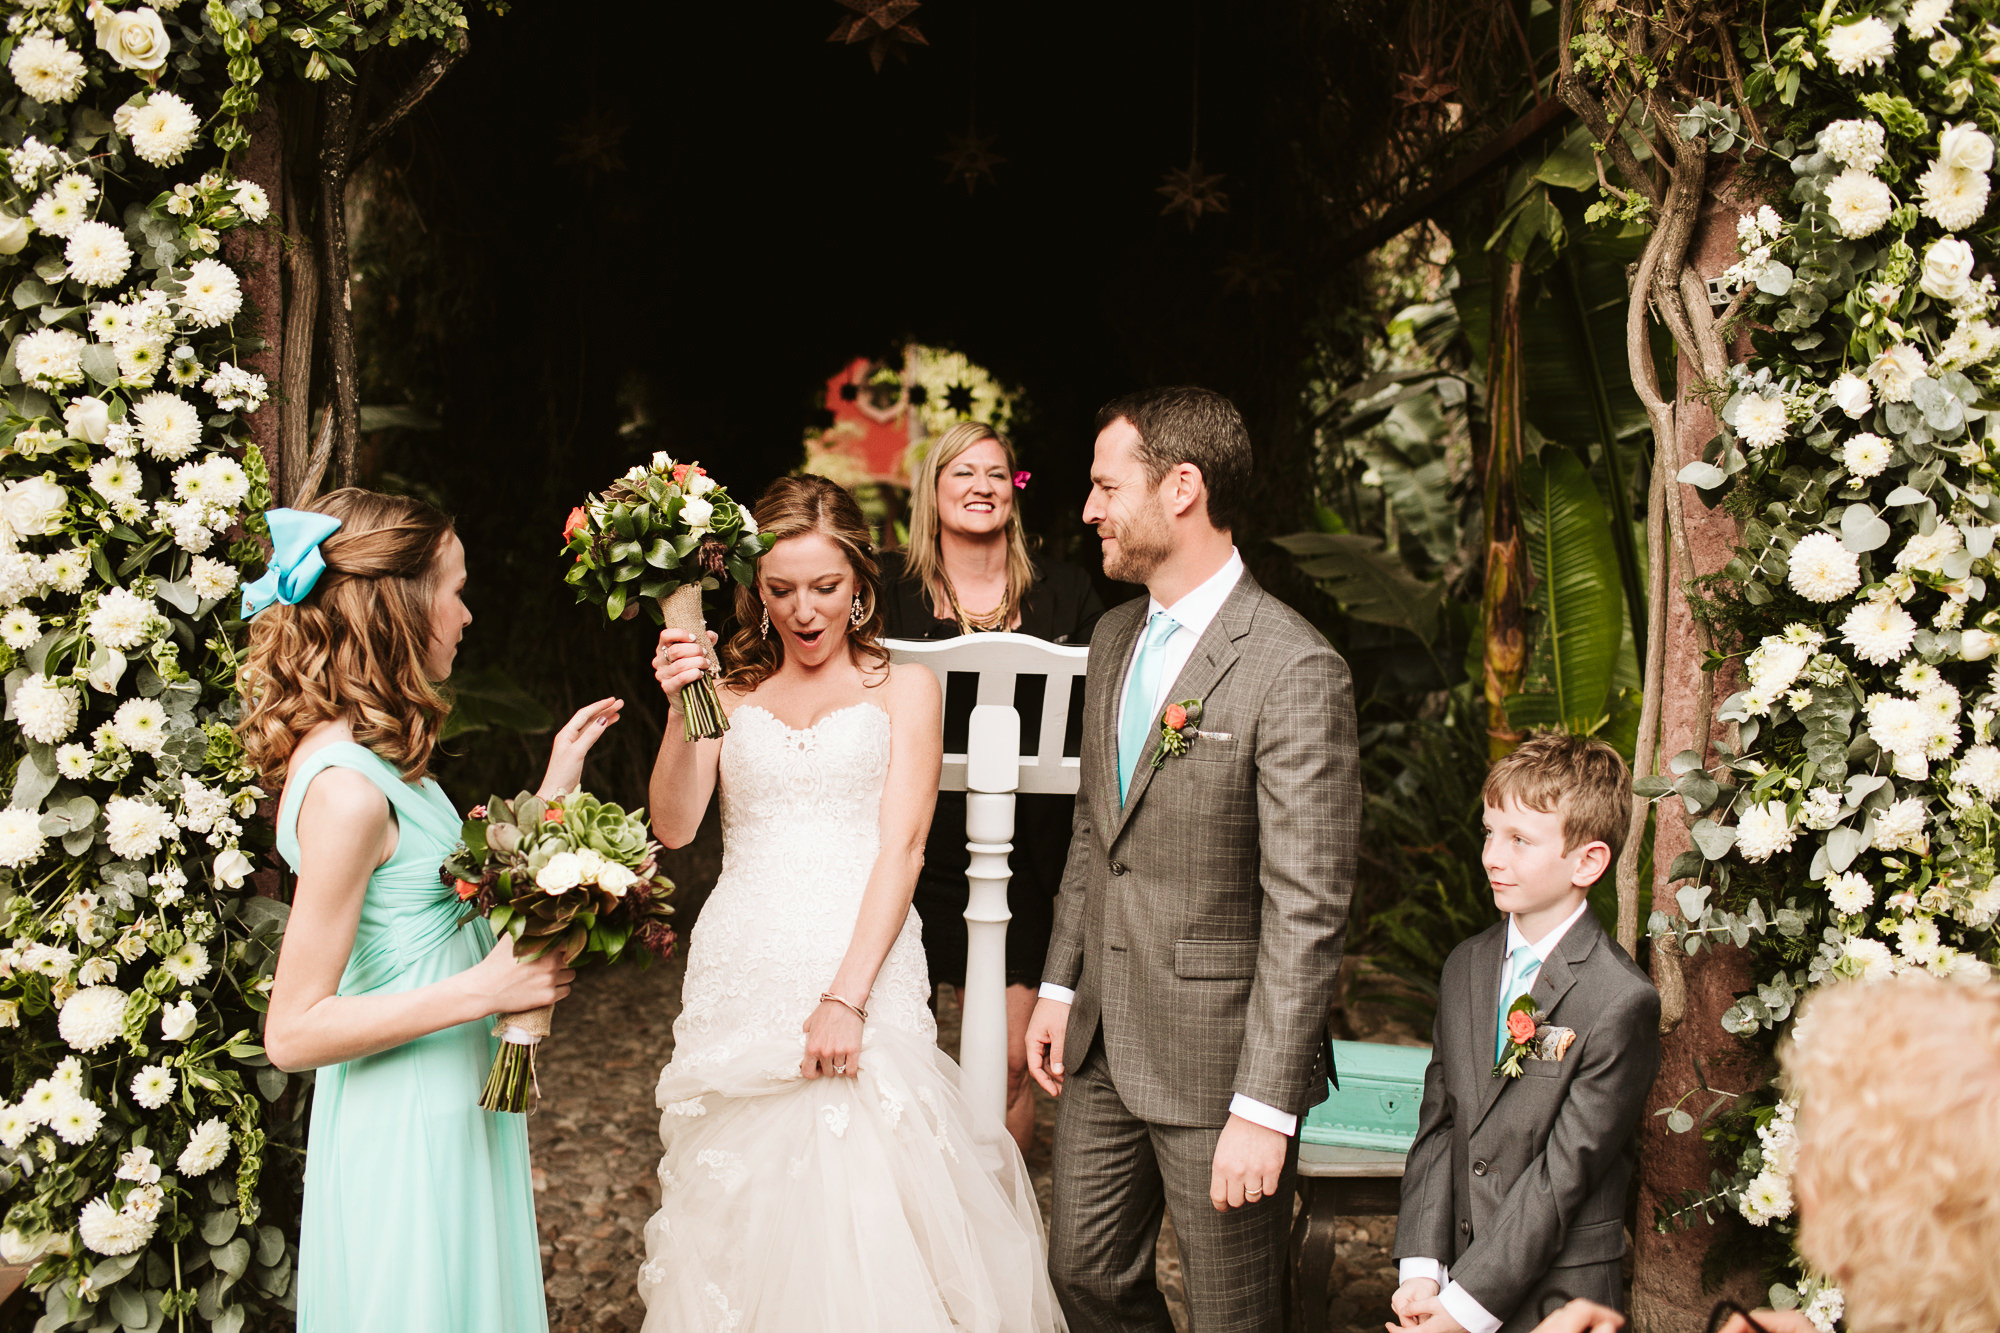 Destination-wedding-photographer-112.jpg